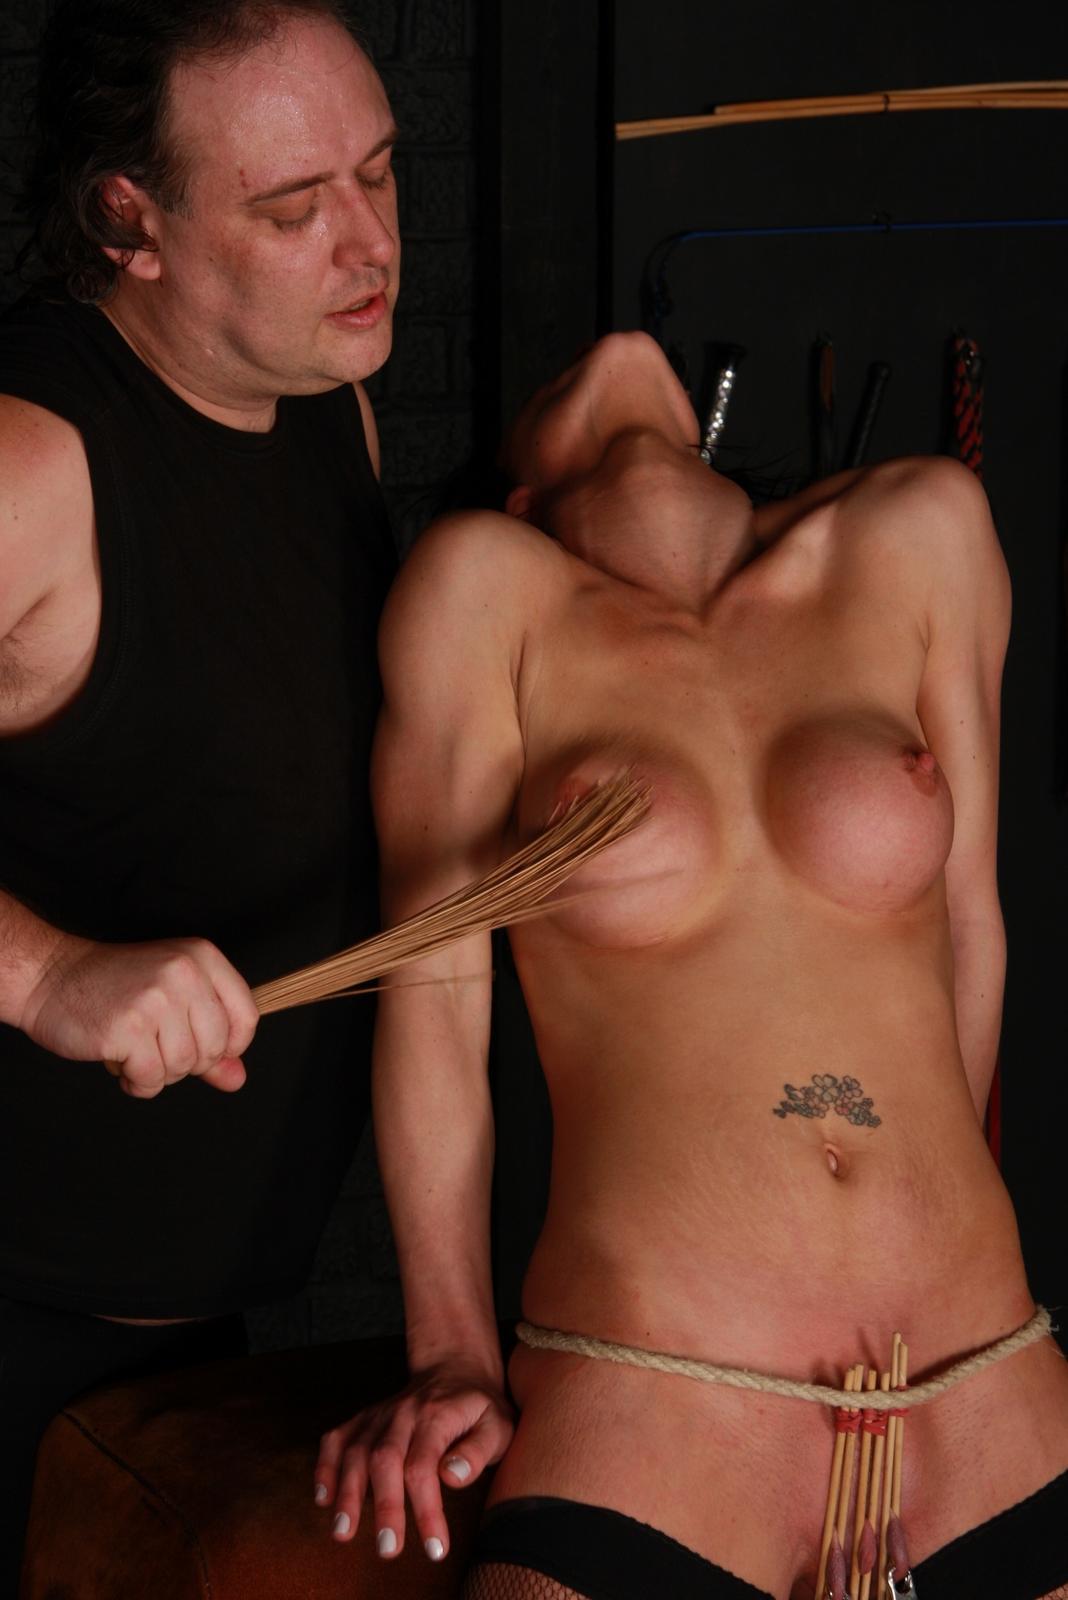 Sado Maso Videos - Sex Tube Box - Hard Sex Tube Porn